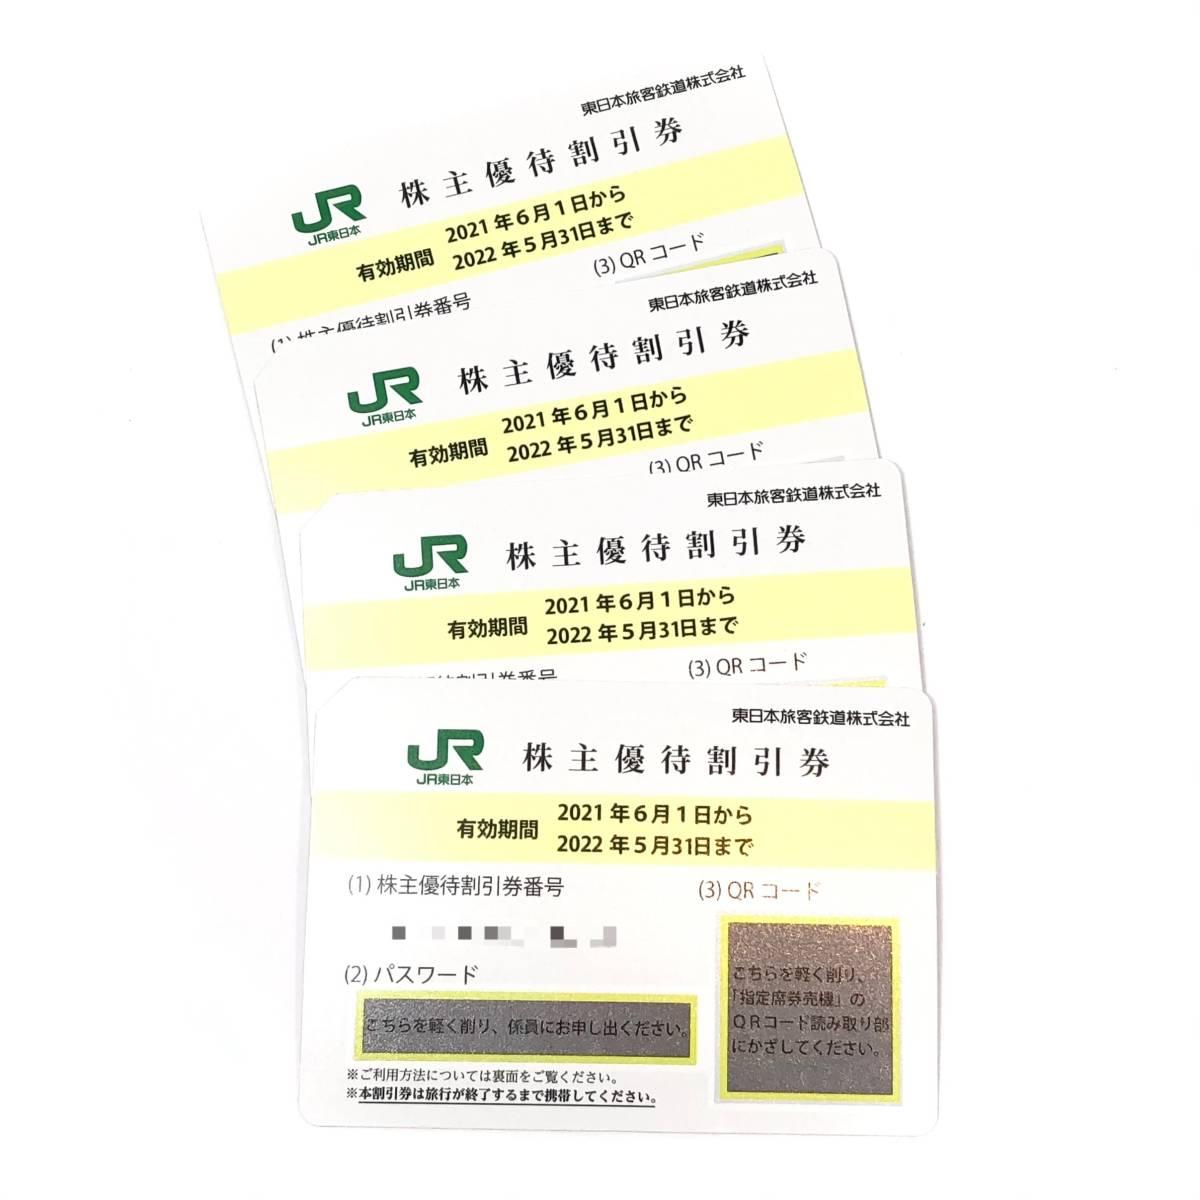 ▼【送料無料】JR東日本 株主優待割引券 4枚セット 東日本旅客鉄道 2021年6月1日~2022年5月31日まで有効_画像1